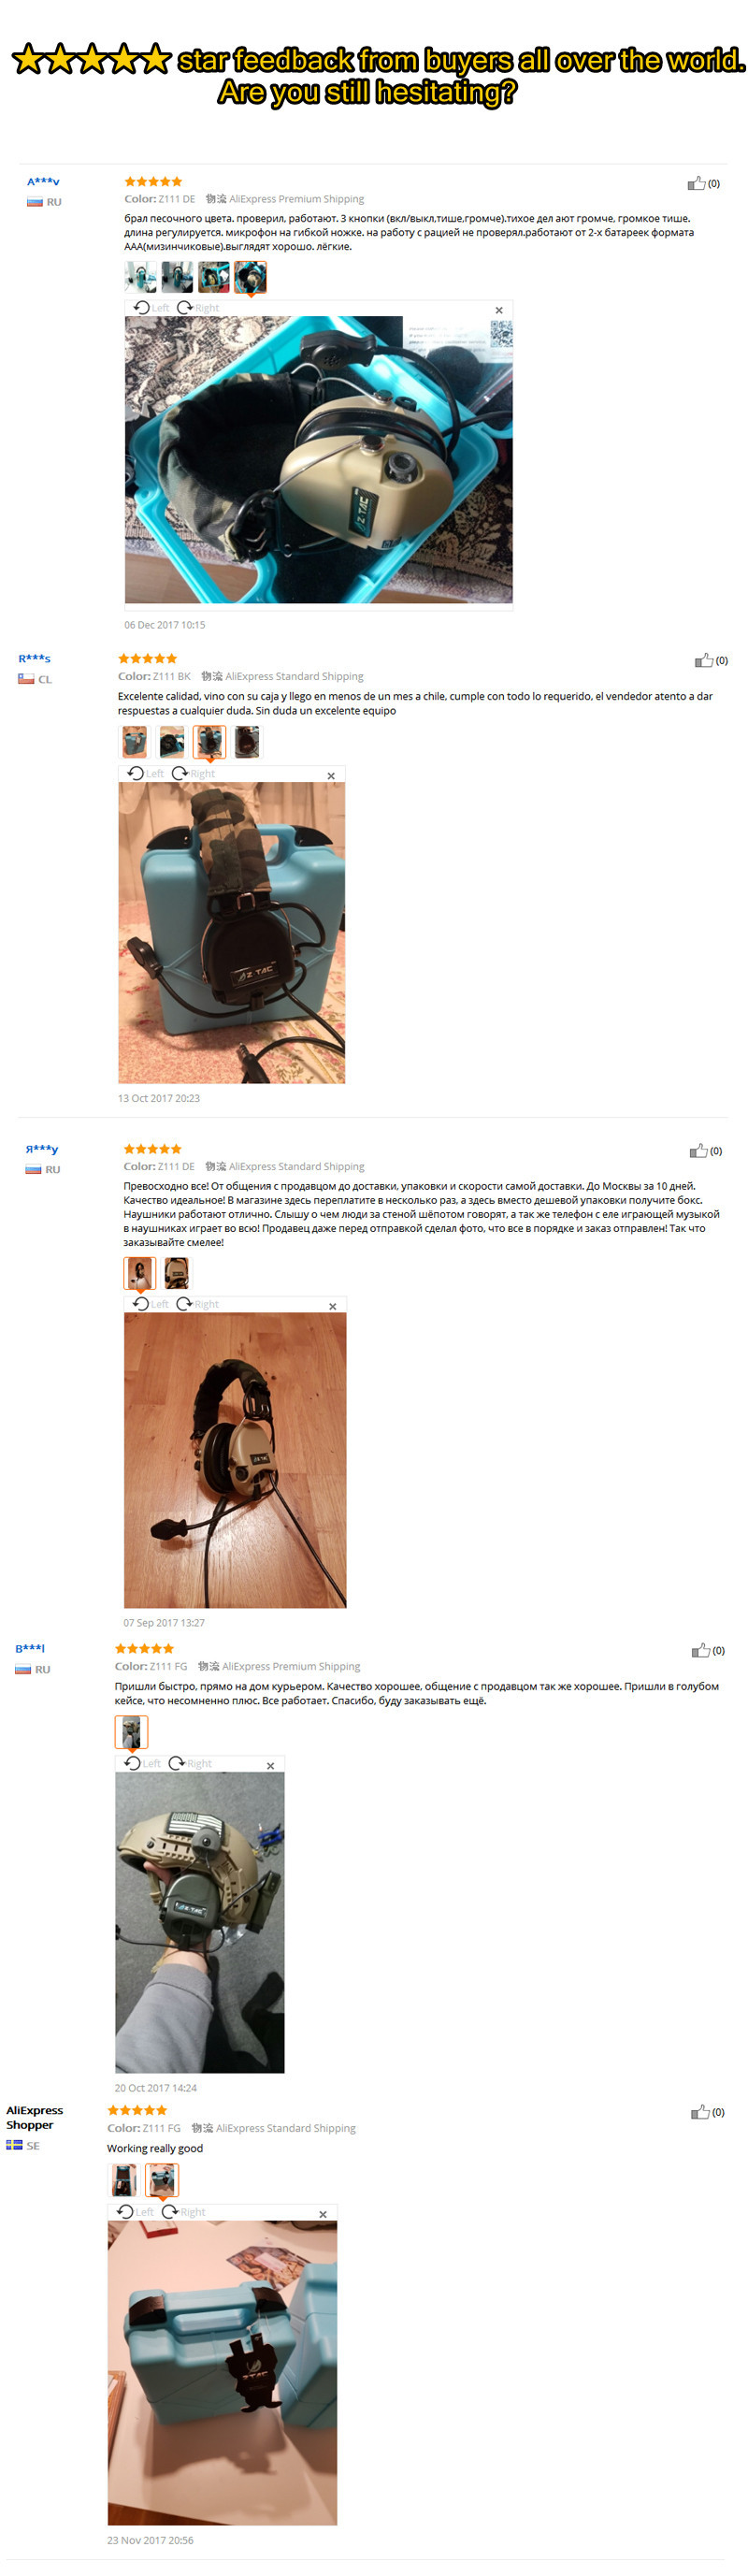 capacete adaptador ipsc fone de ouvido